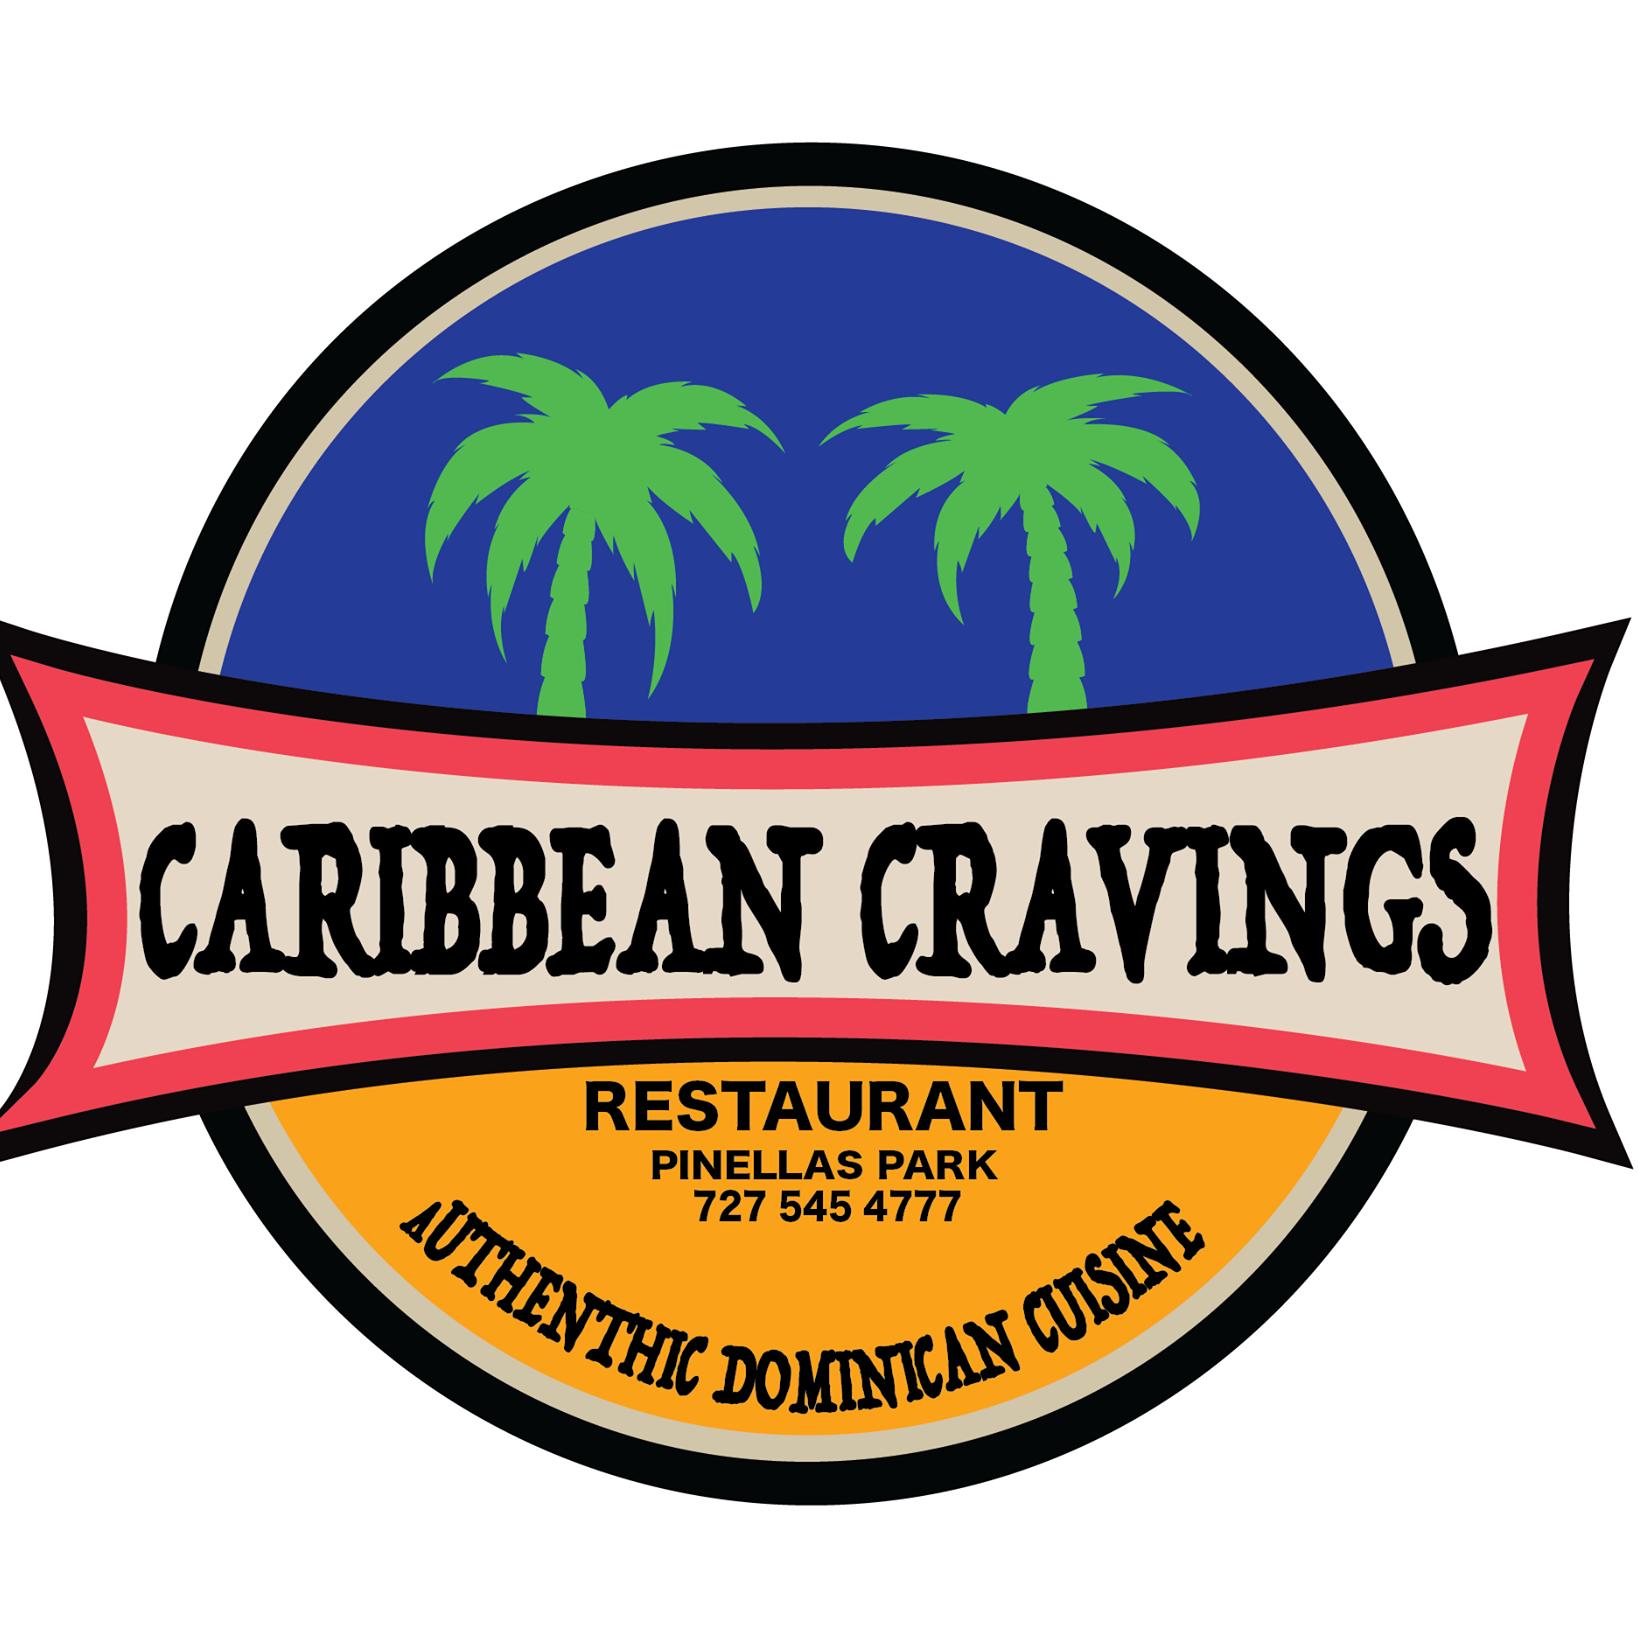 Caribbean Cravings Pinellas Park FL